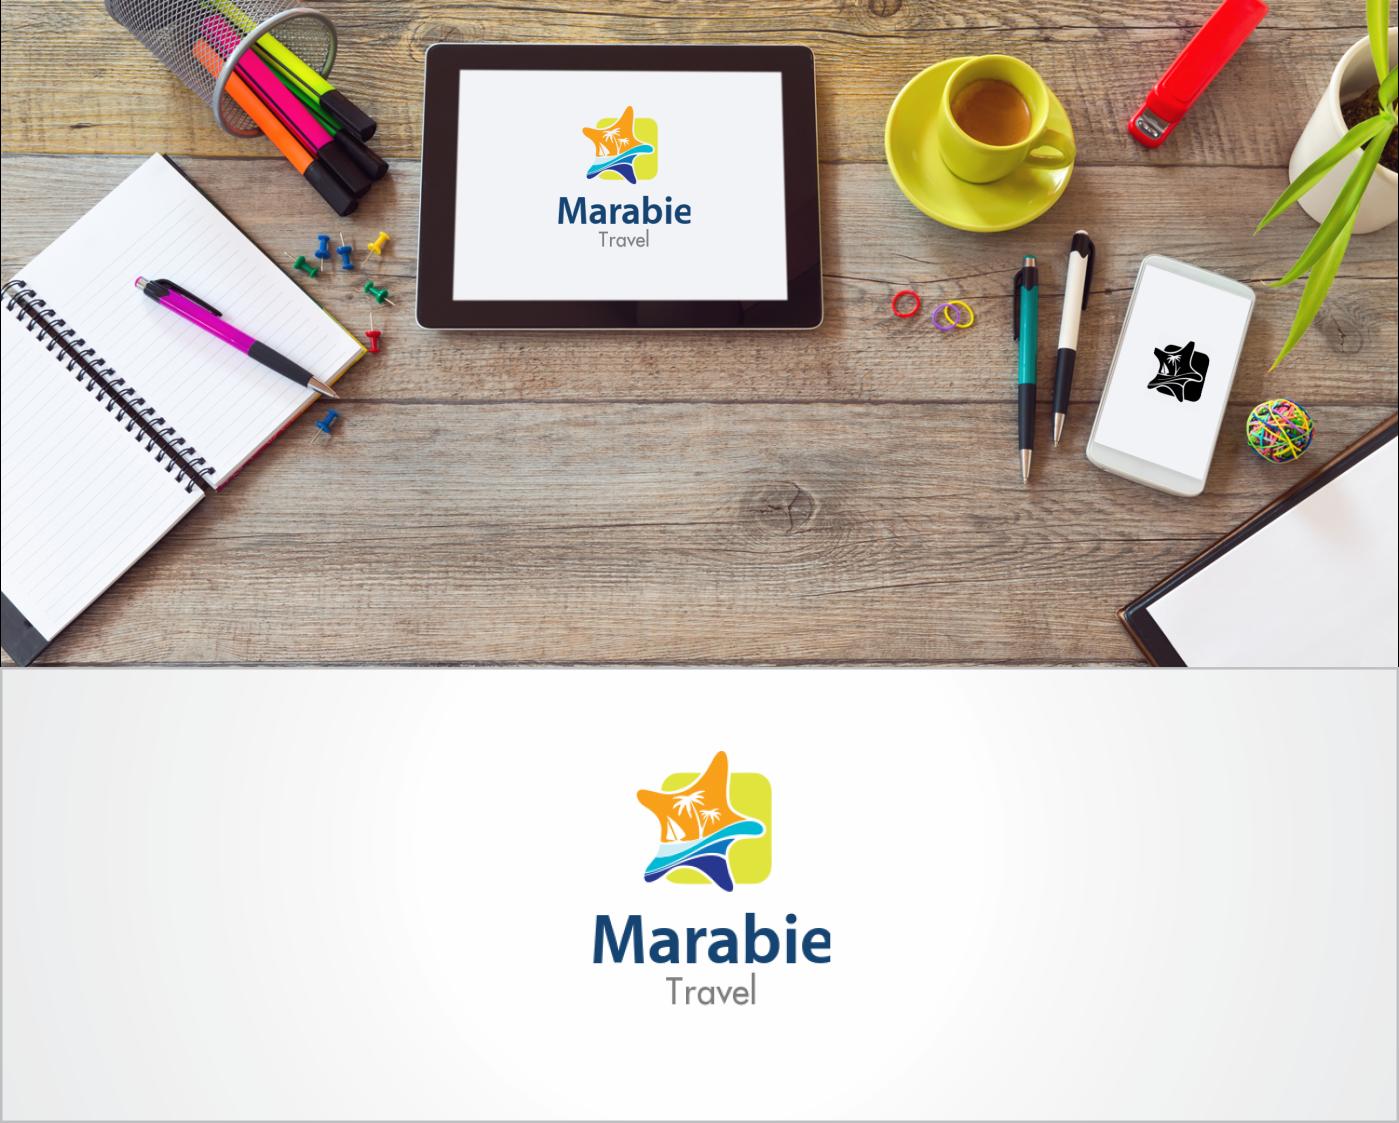 Upmarket, Conservative, Travel Agent Logo Design for Marabie Travel